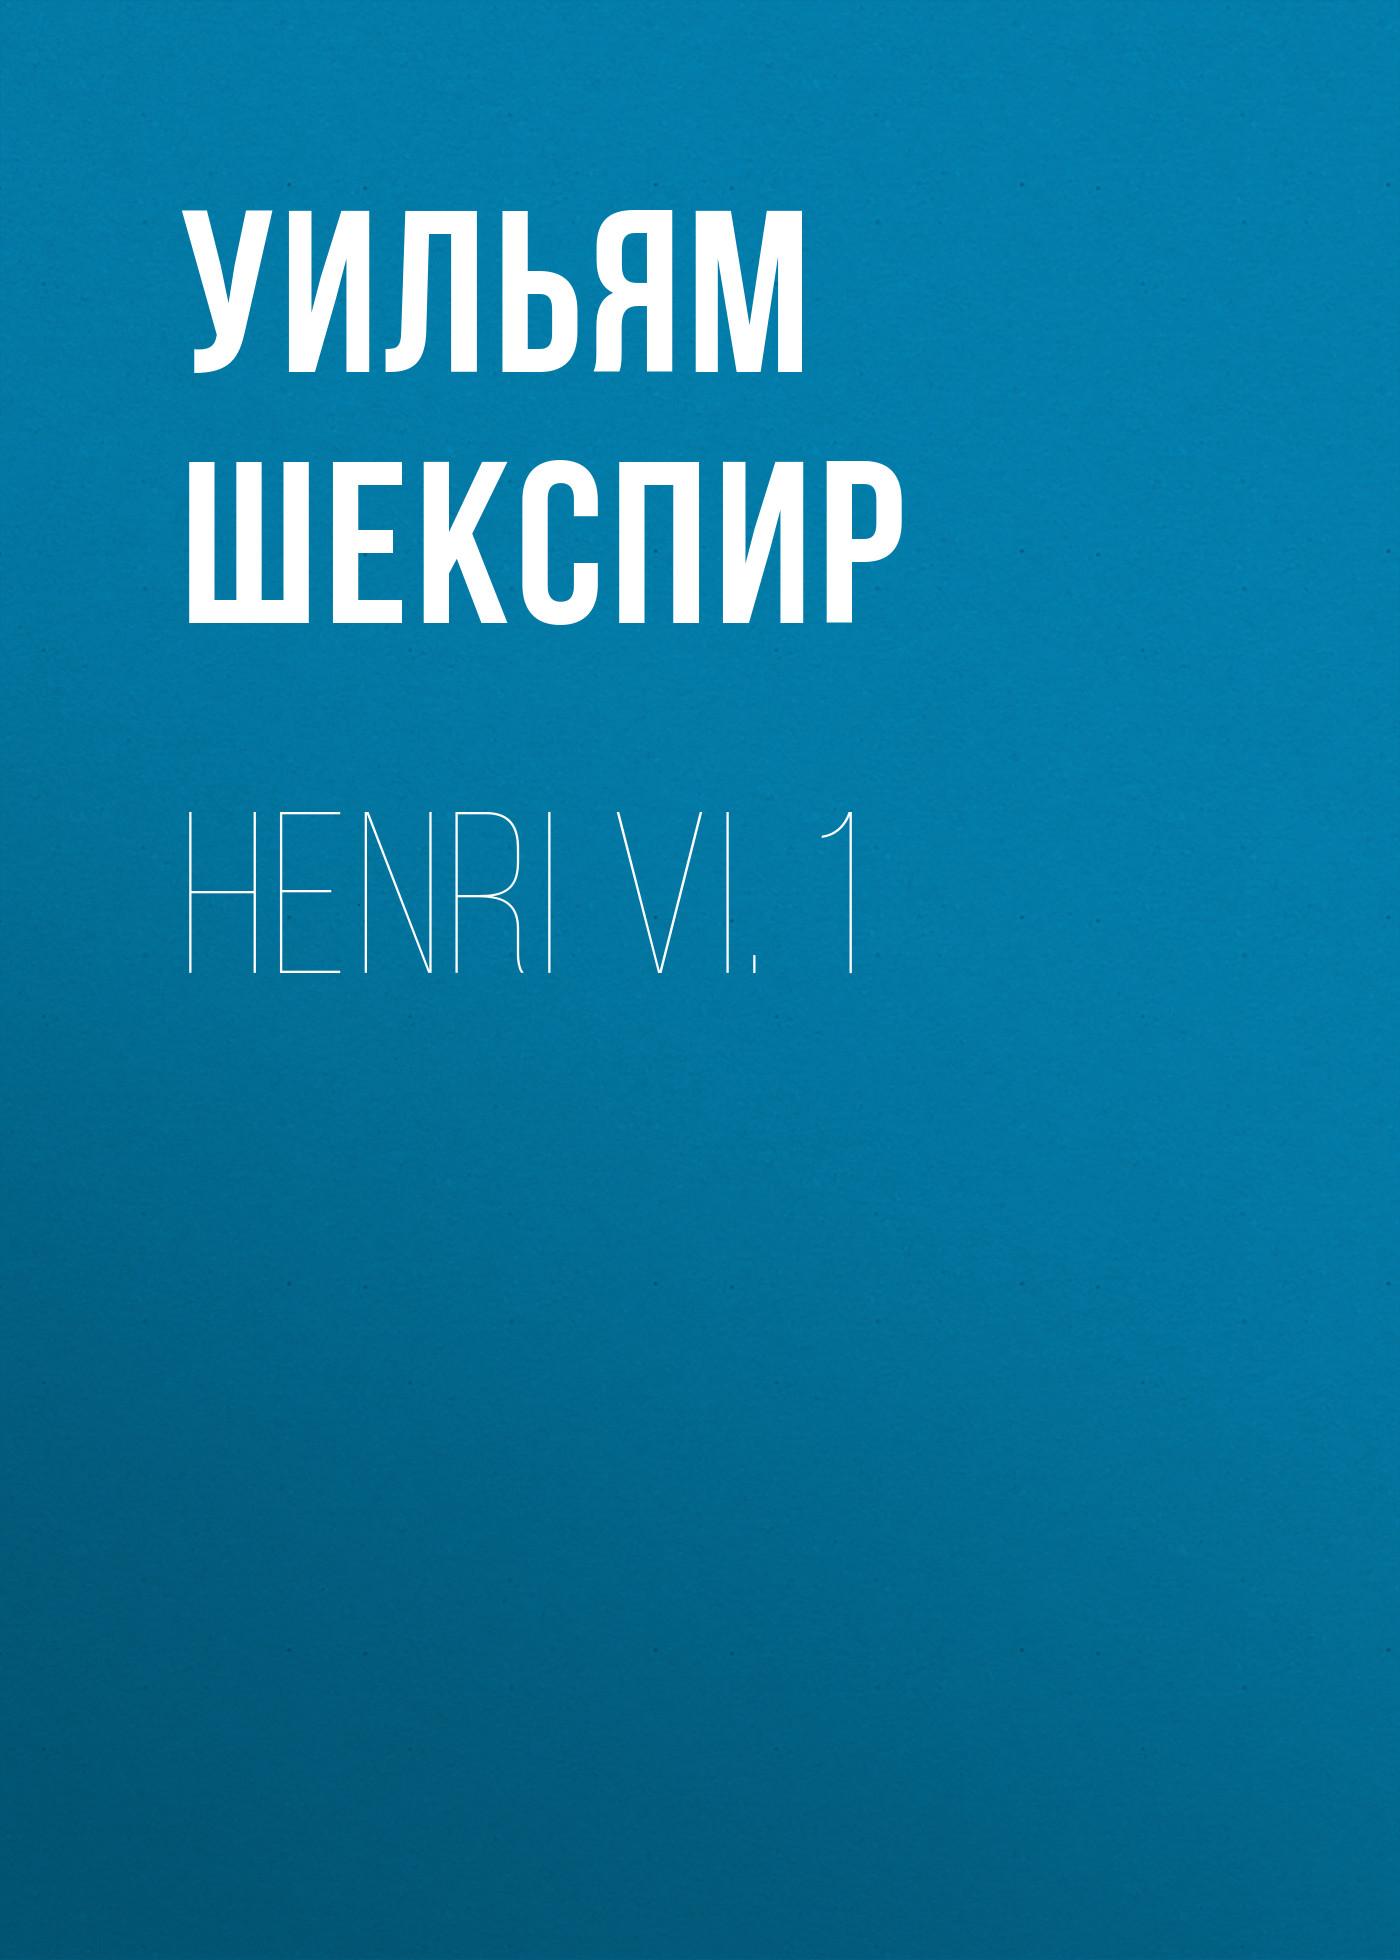 Henri VI. 1